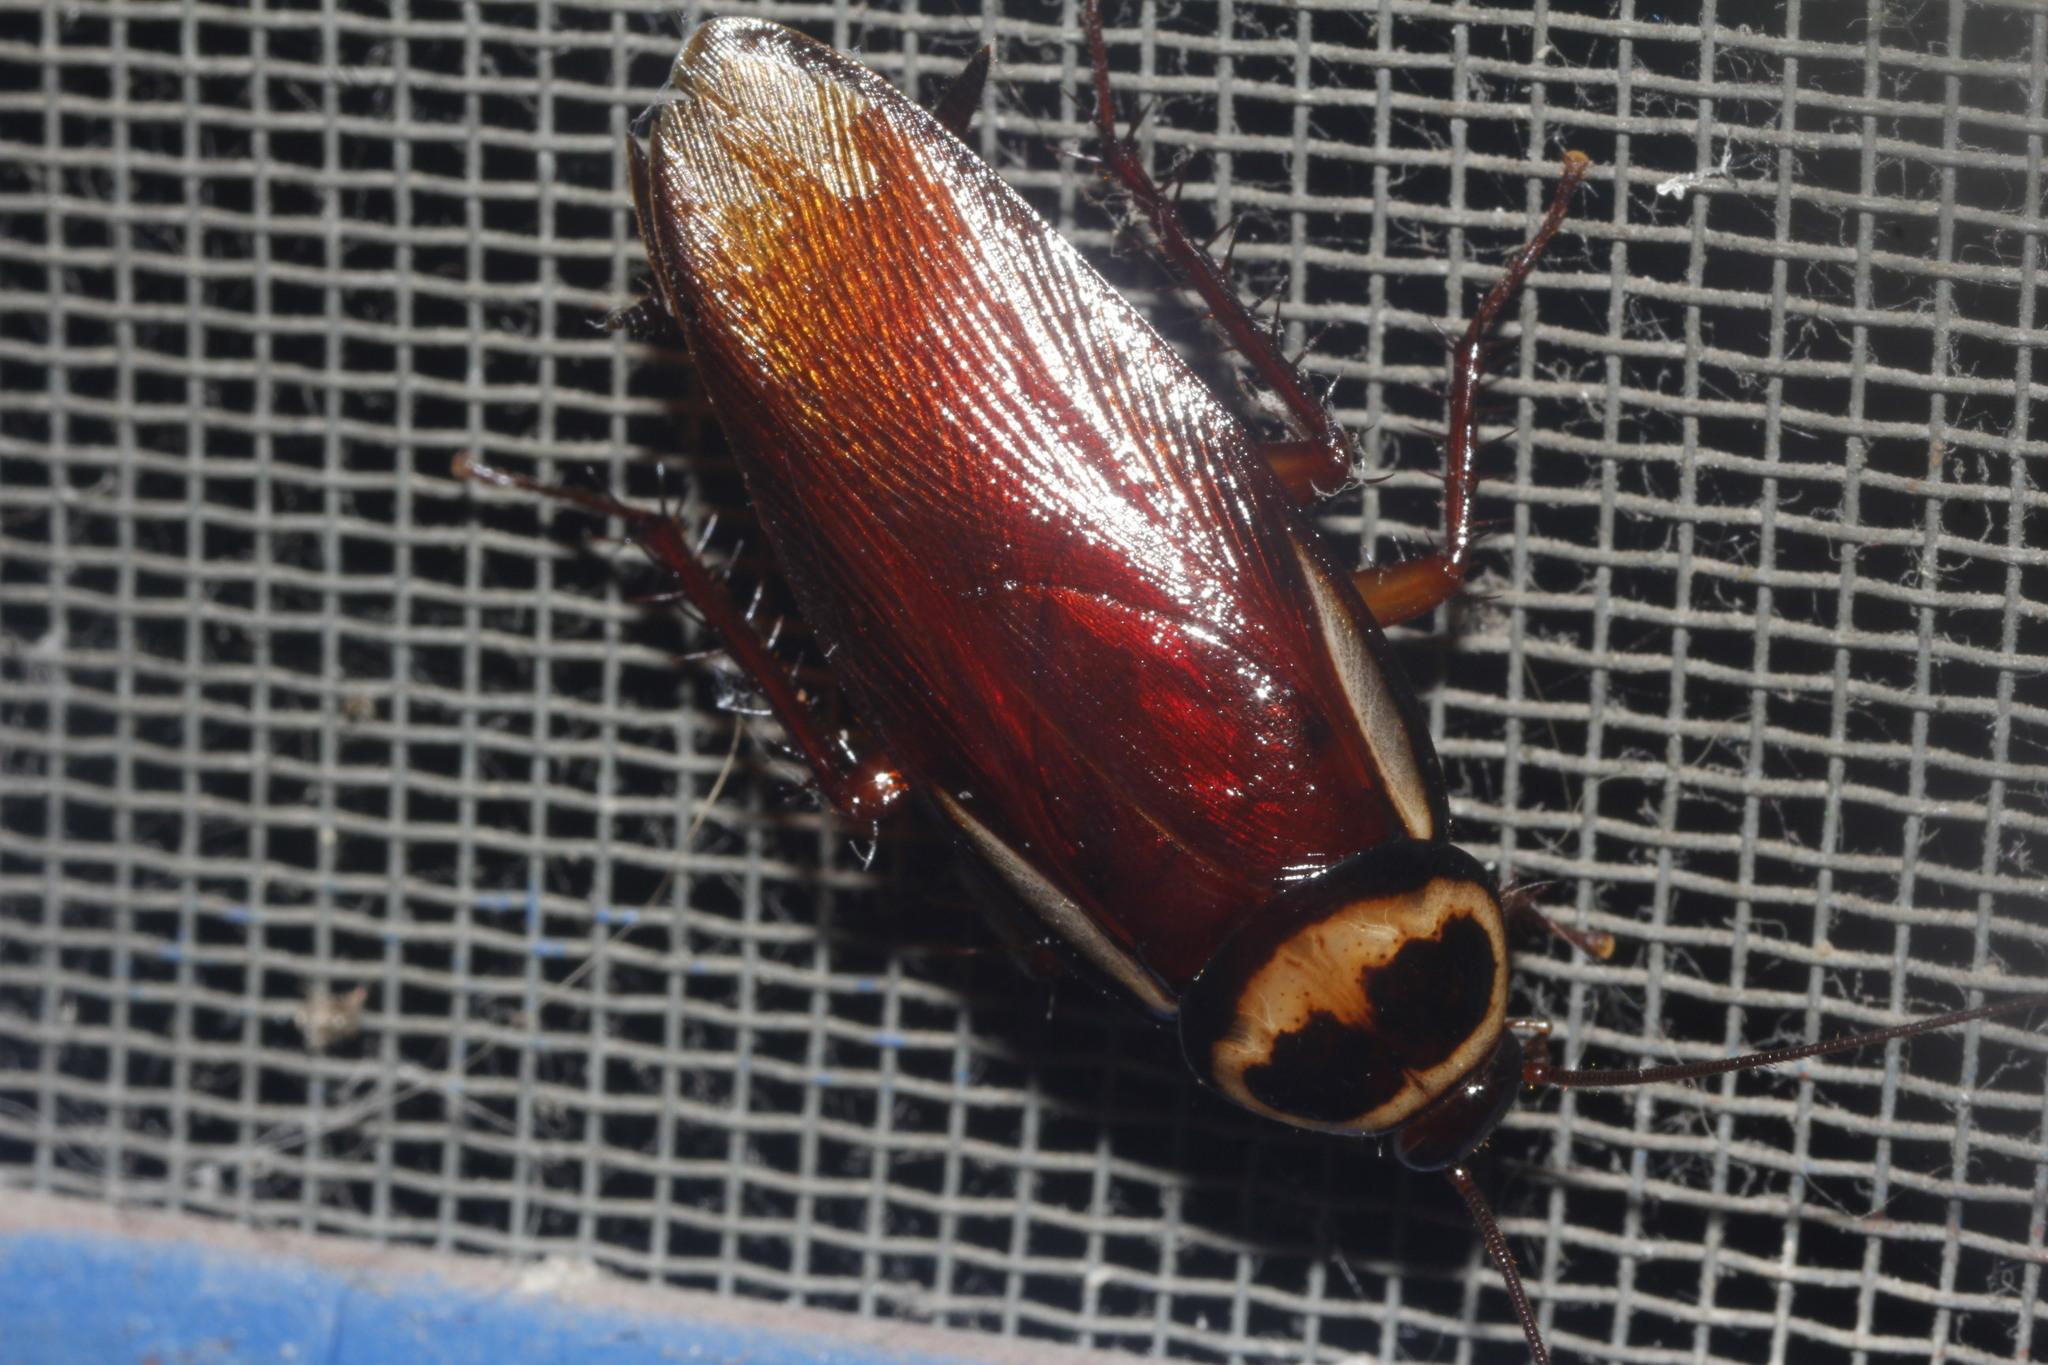 Image of Australian cockroach